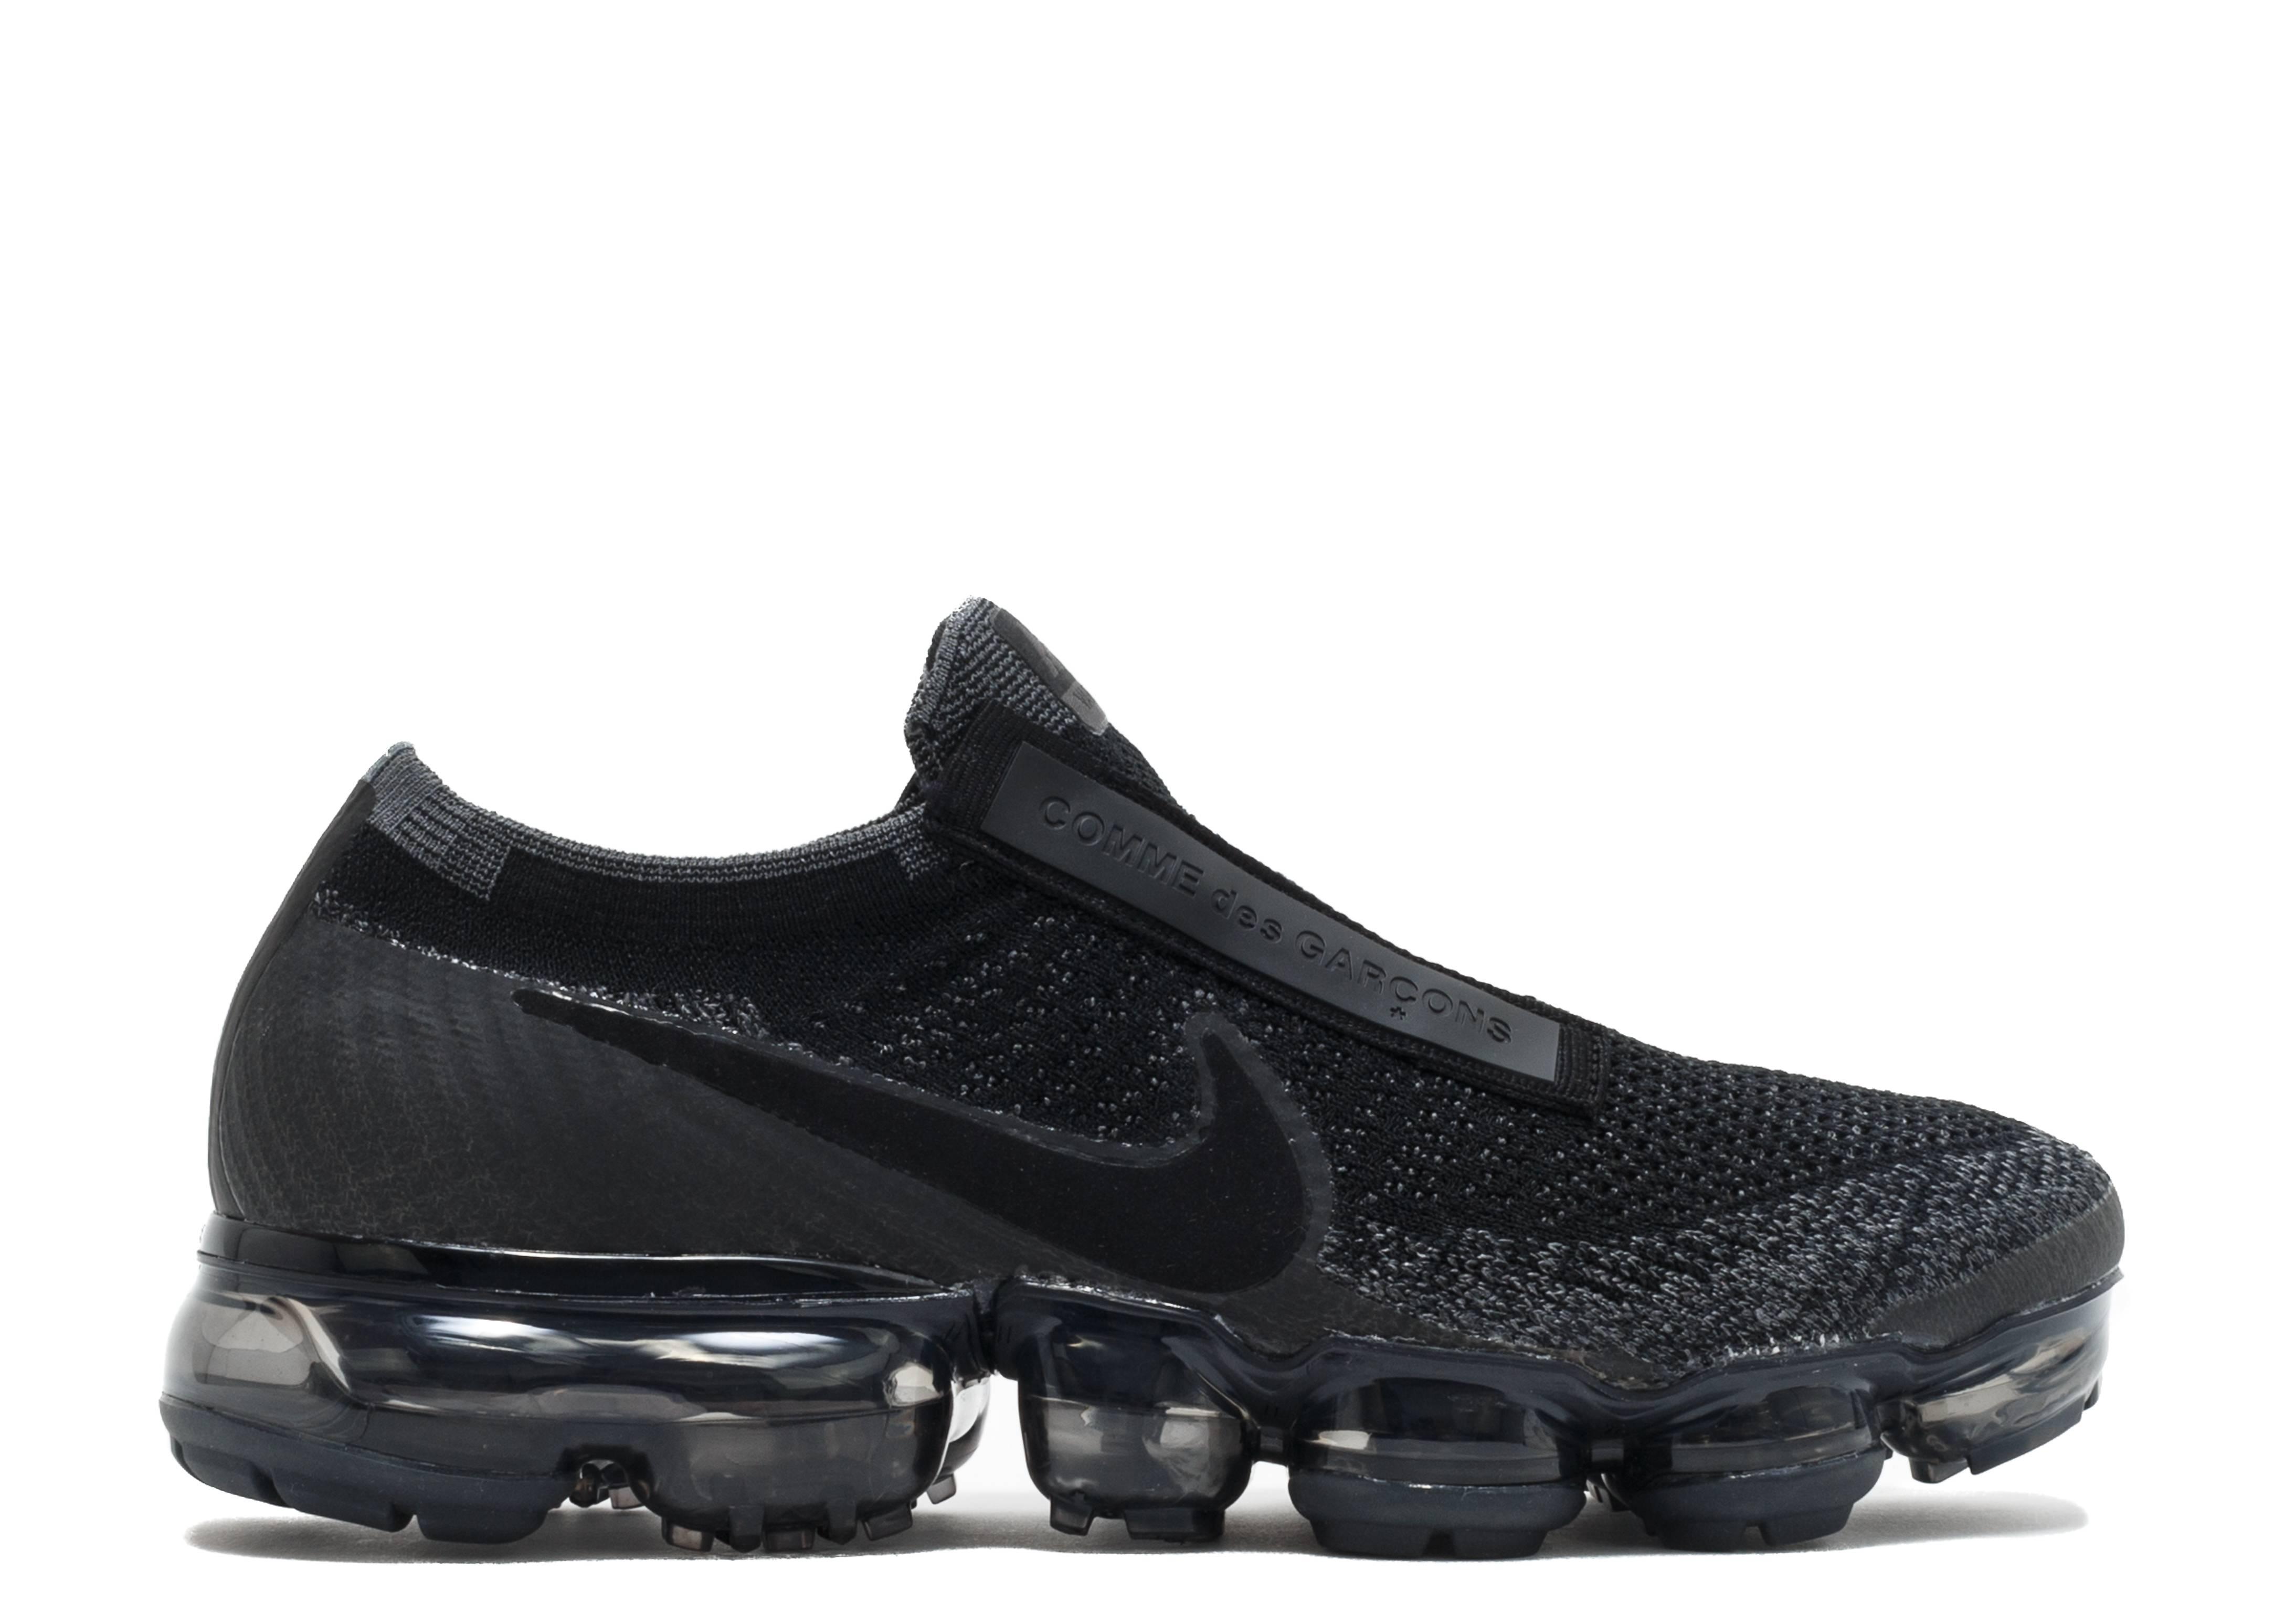 best sneakers 58236 7a292 w nike air vapormax fk/ cdg